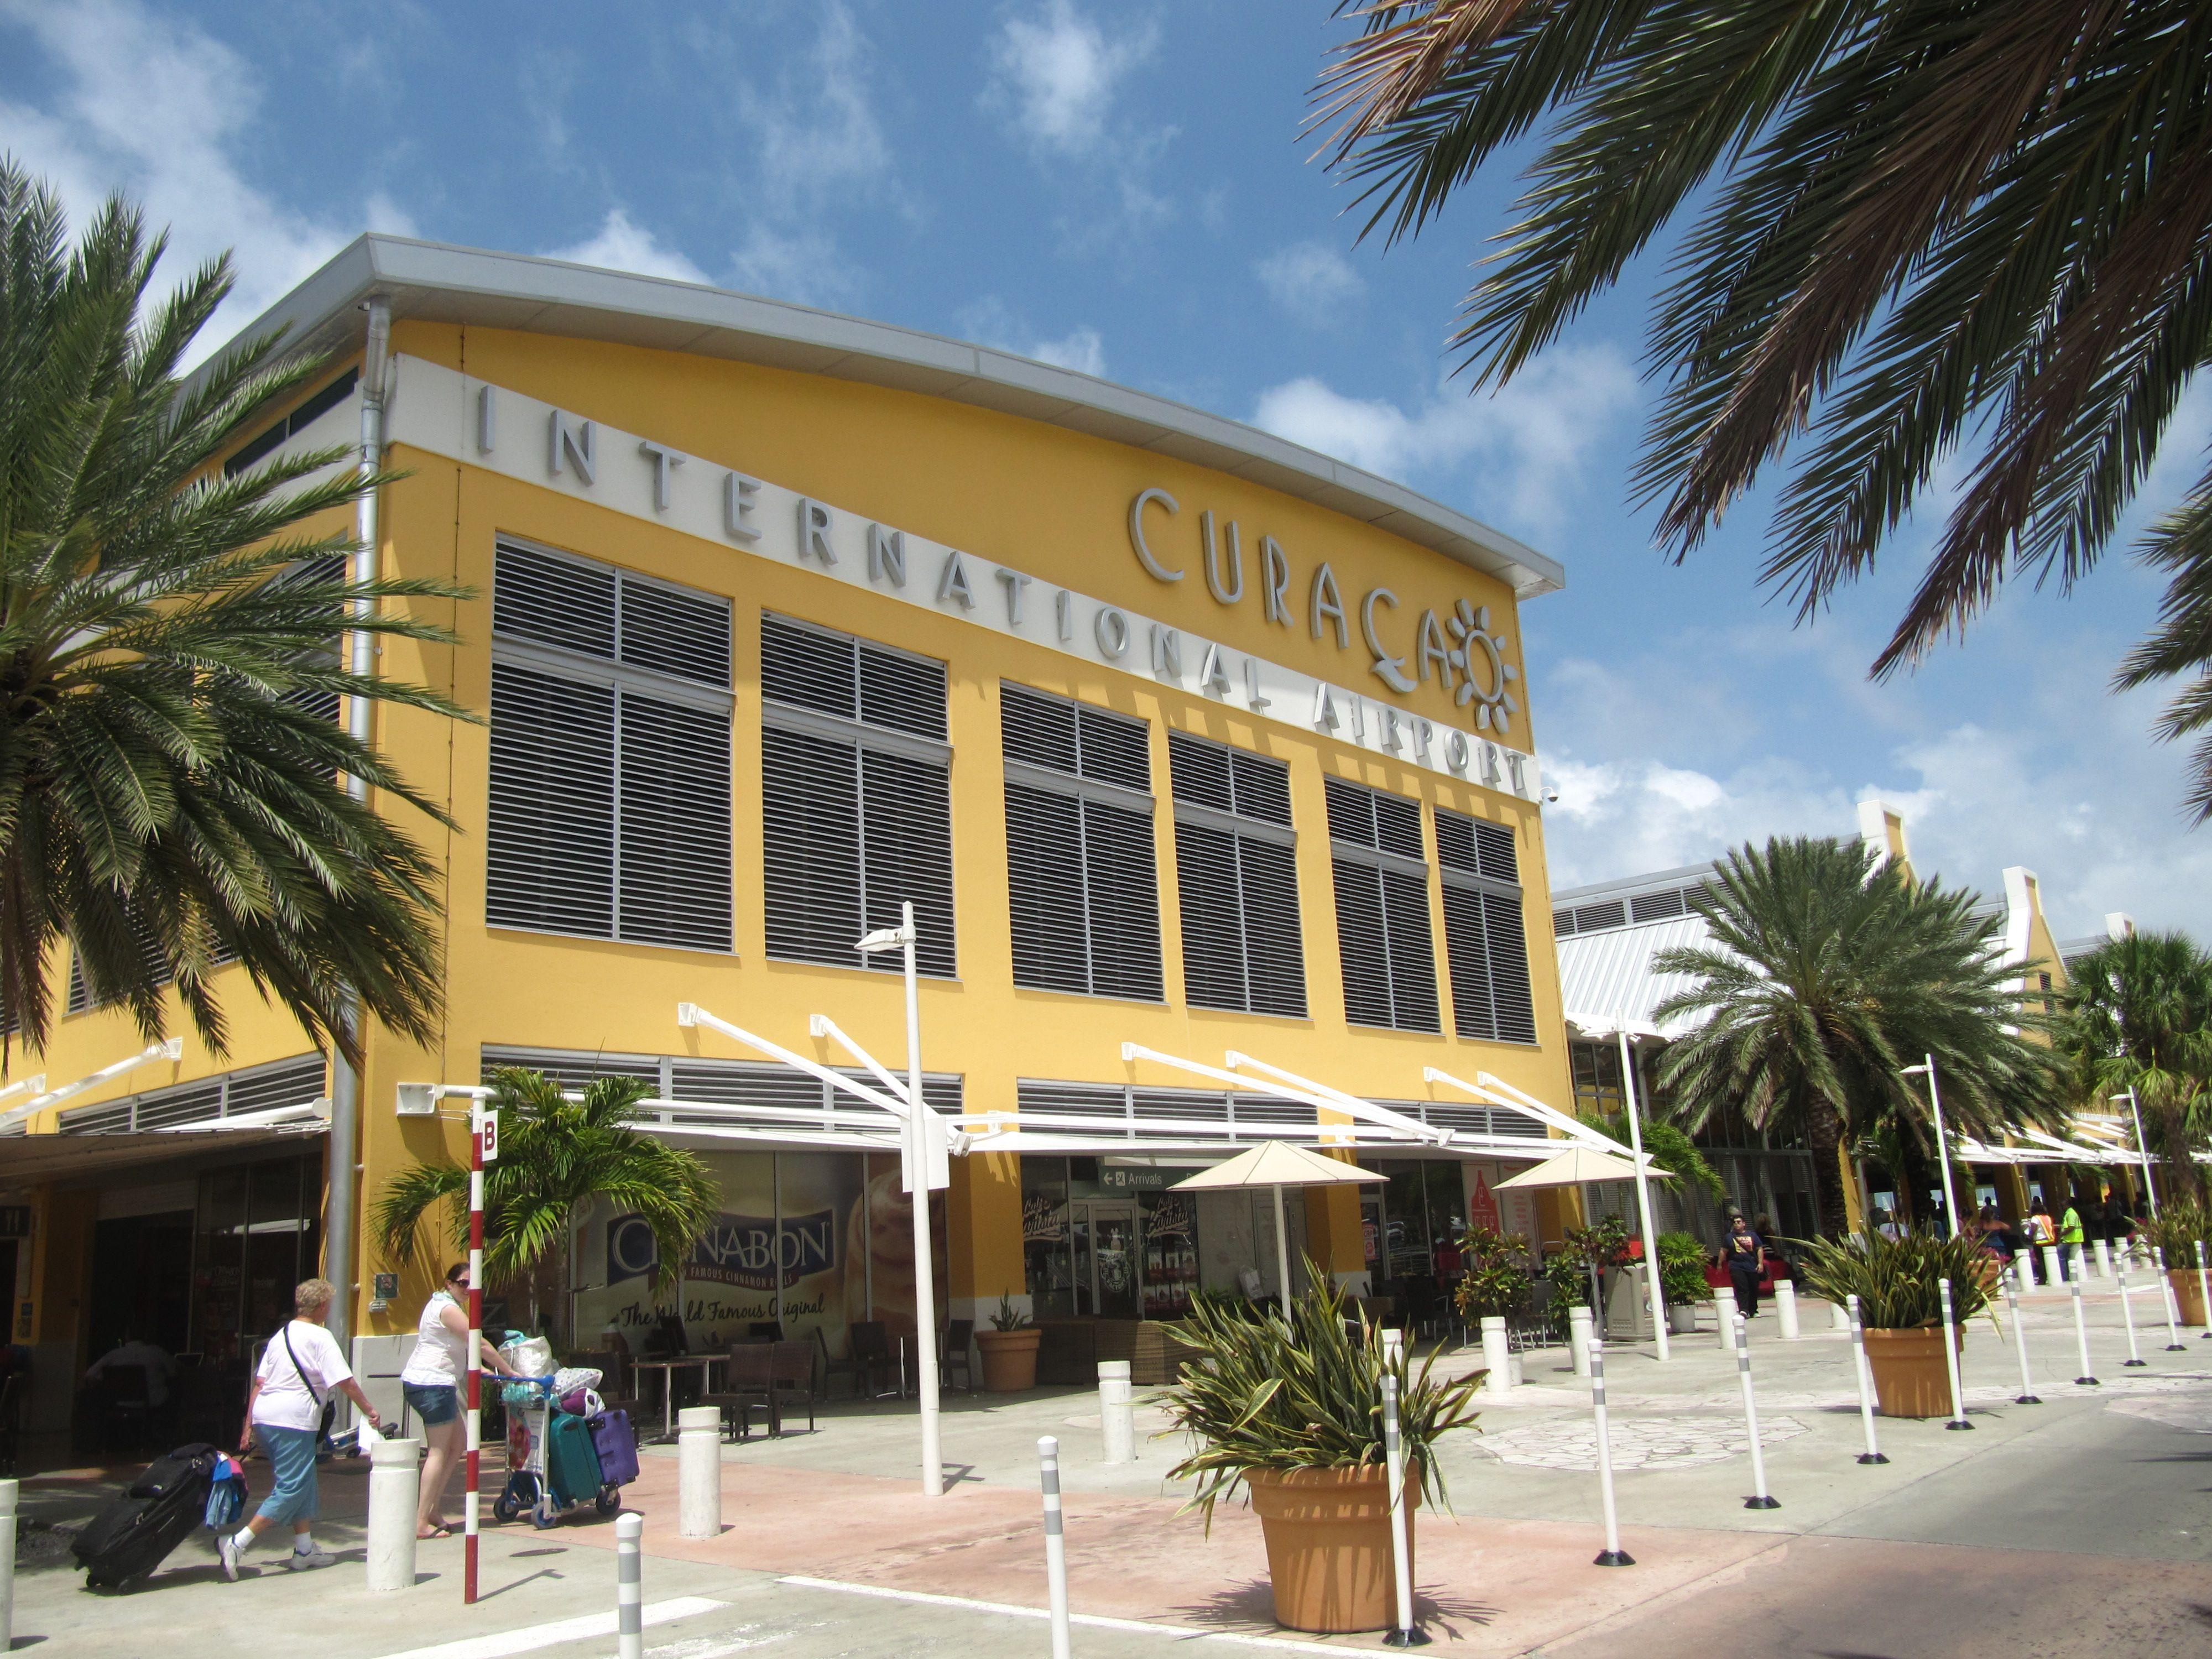 Hato International Airport Curaçao Cur In Willemstad